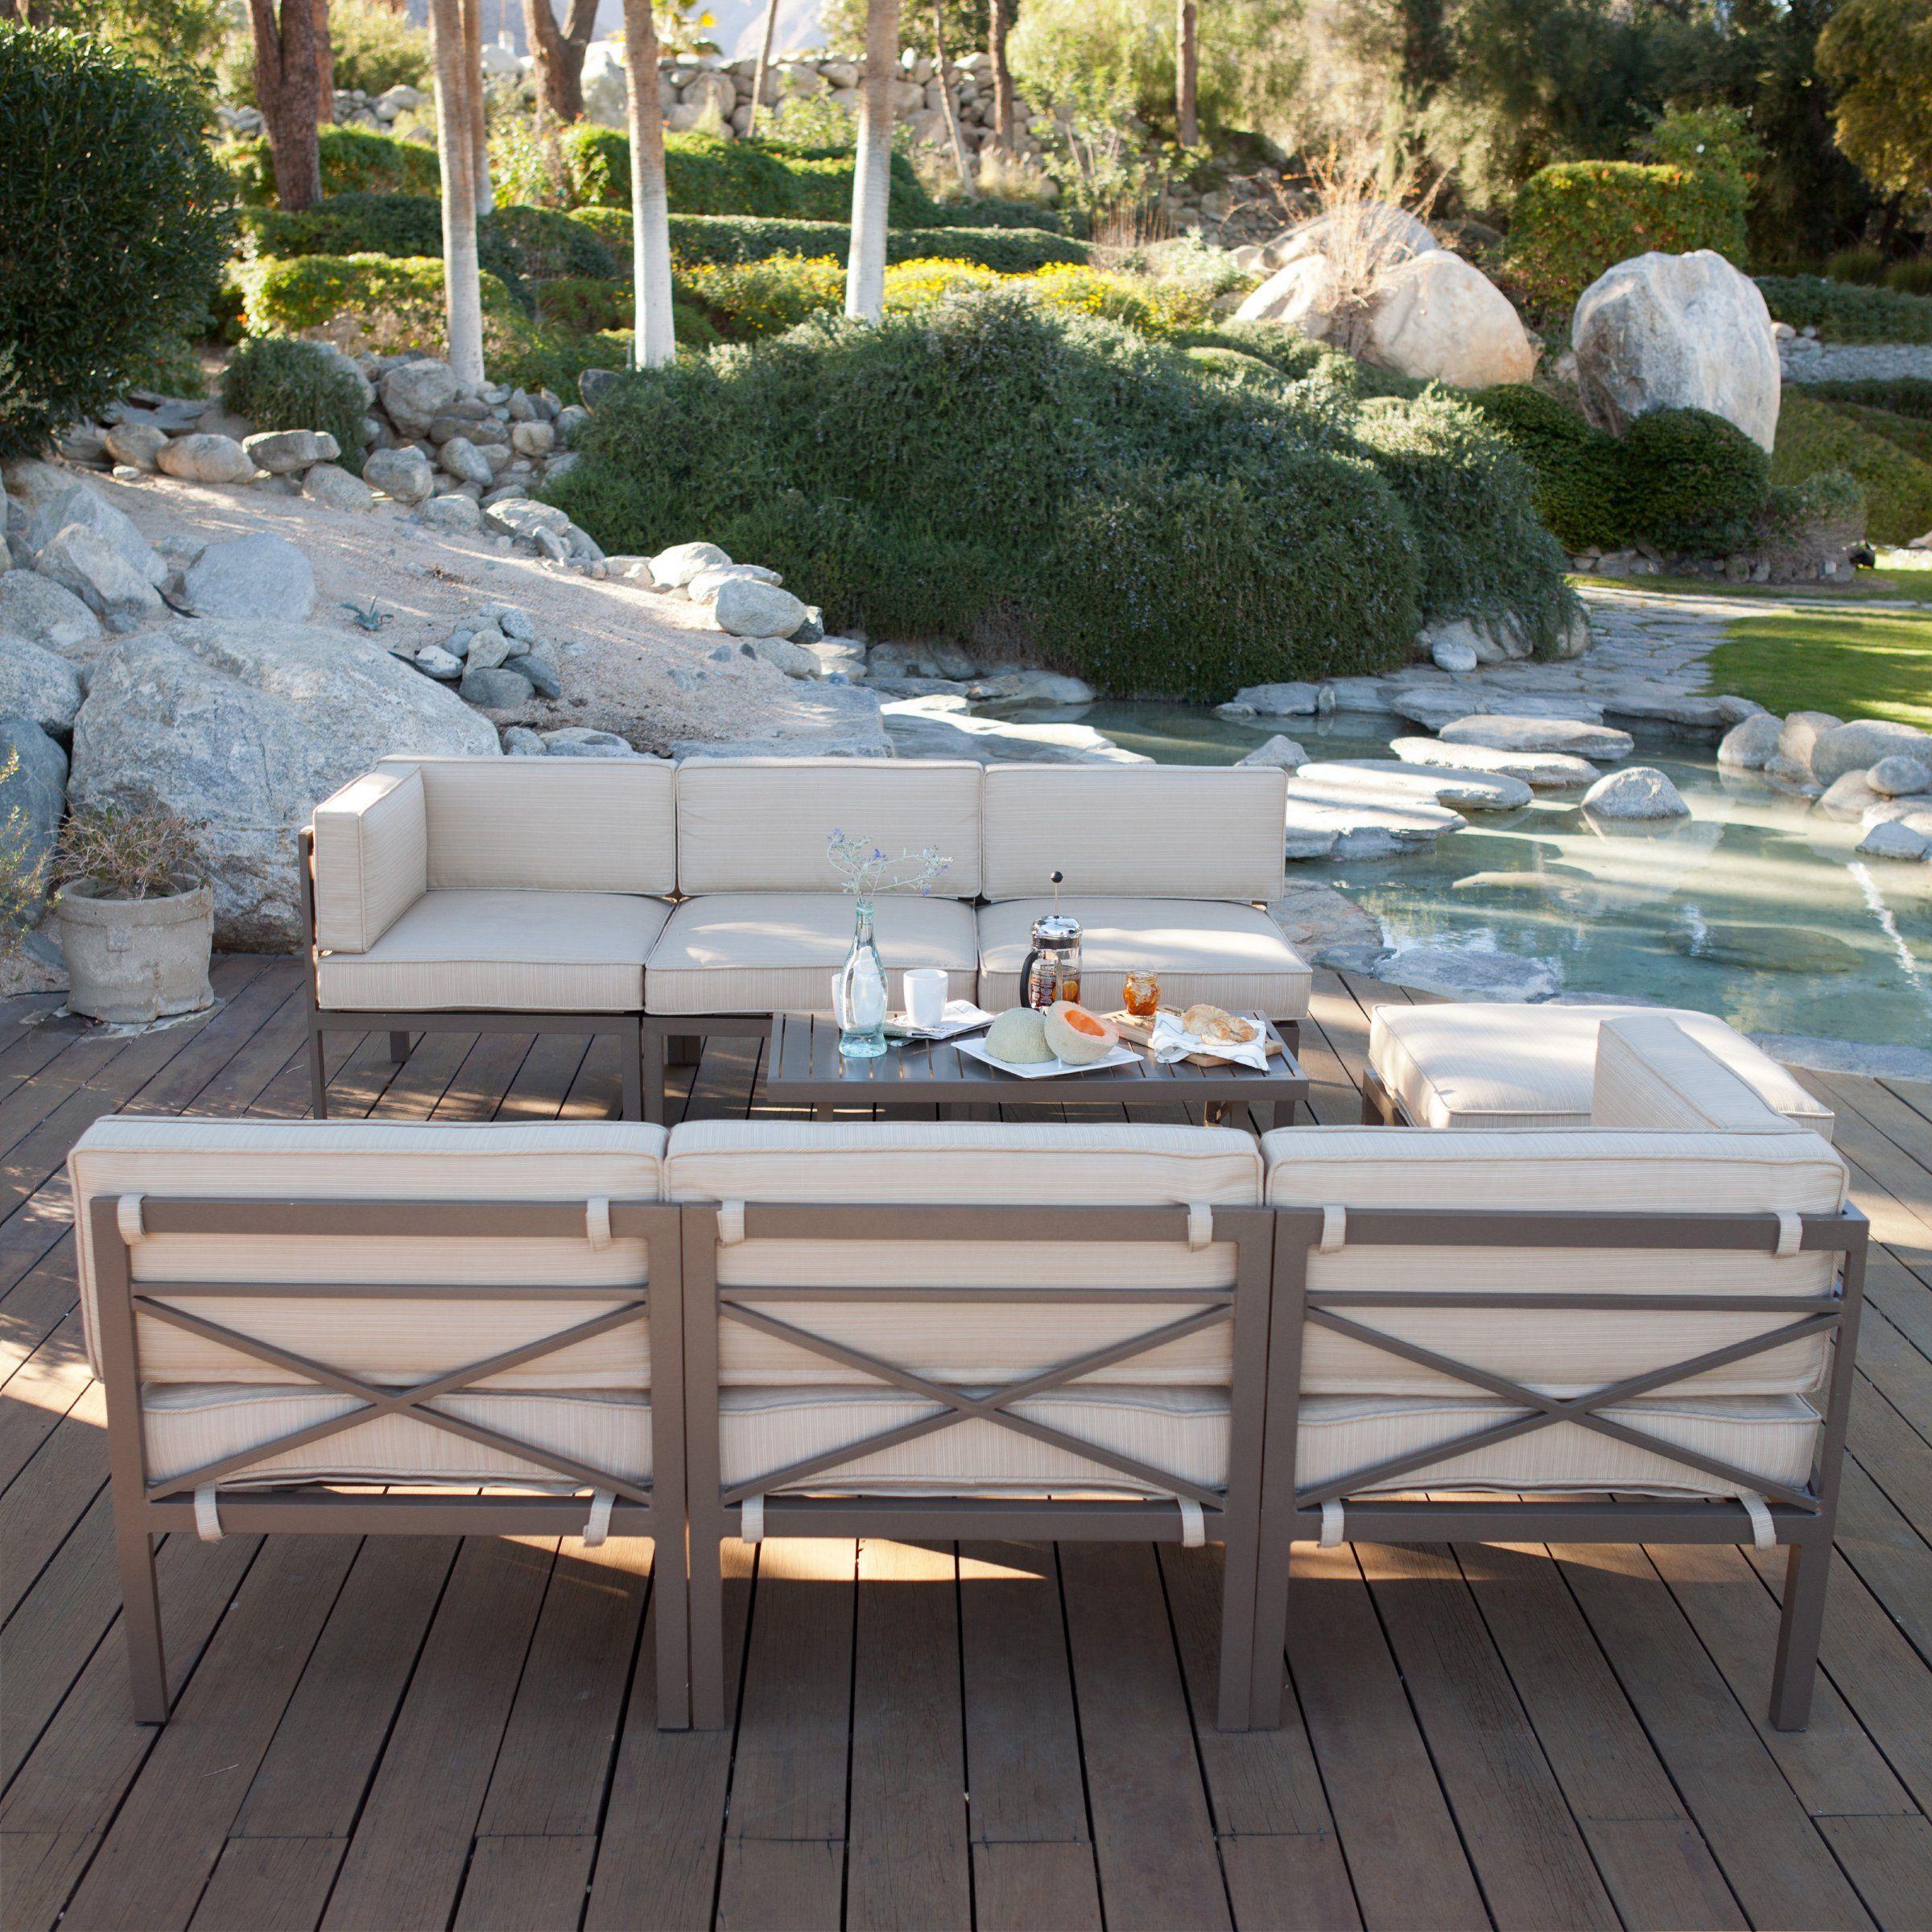 Coral Coast Bellagio 10 pc. Aluminum Sectional Sofa Set - Seats 8 - Conversation Patio Sets at Hayneedle